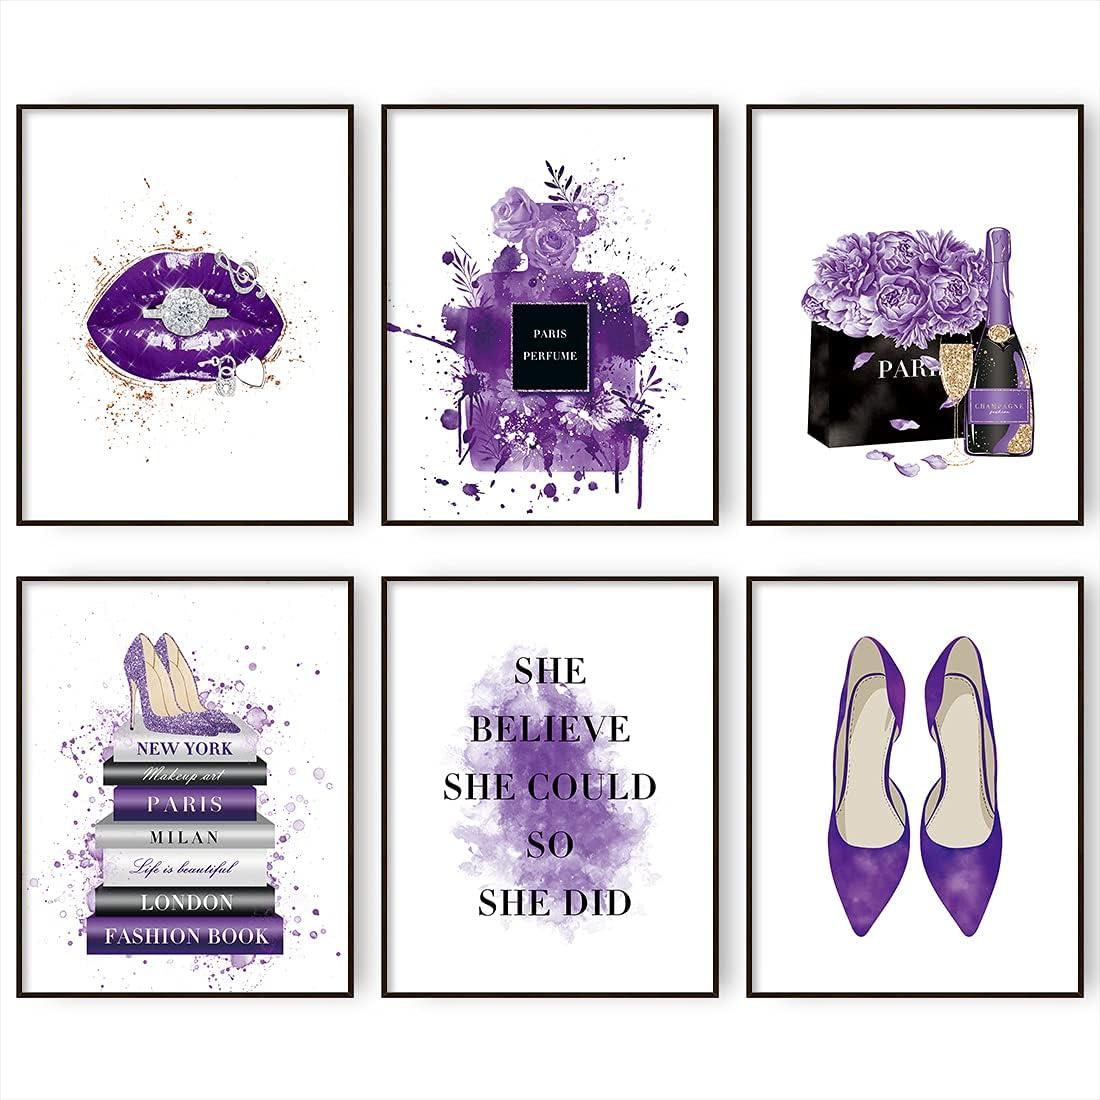 Glam Purple Wall Decor Perfume Bottle Book Lips High Fashion Design Wall Art, Bedroom Decor for Women Poster Prints Set of 6 Girl Room Decor | 8x10 In Unframed (Purple, 8x10 in)